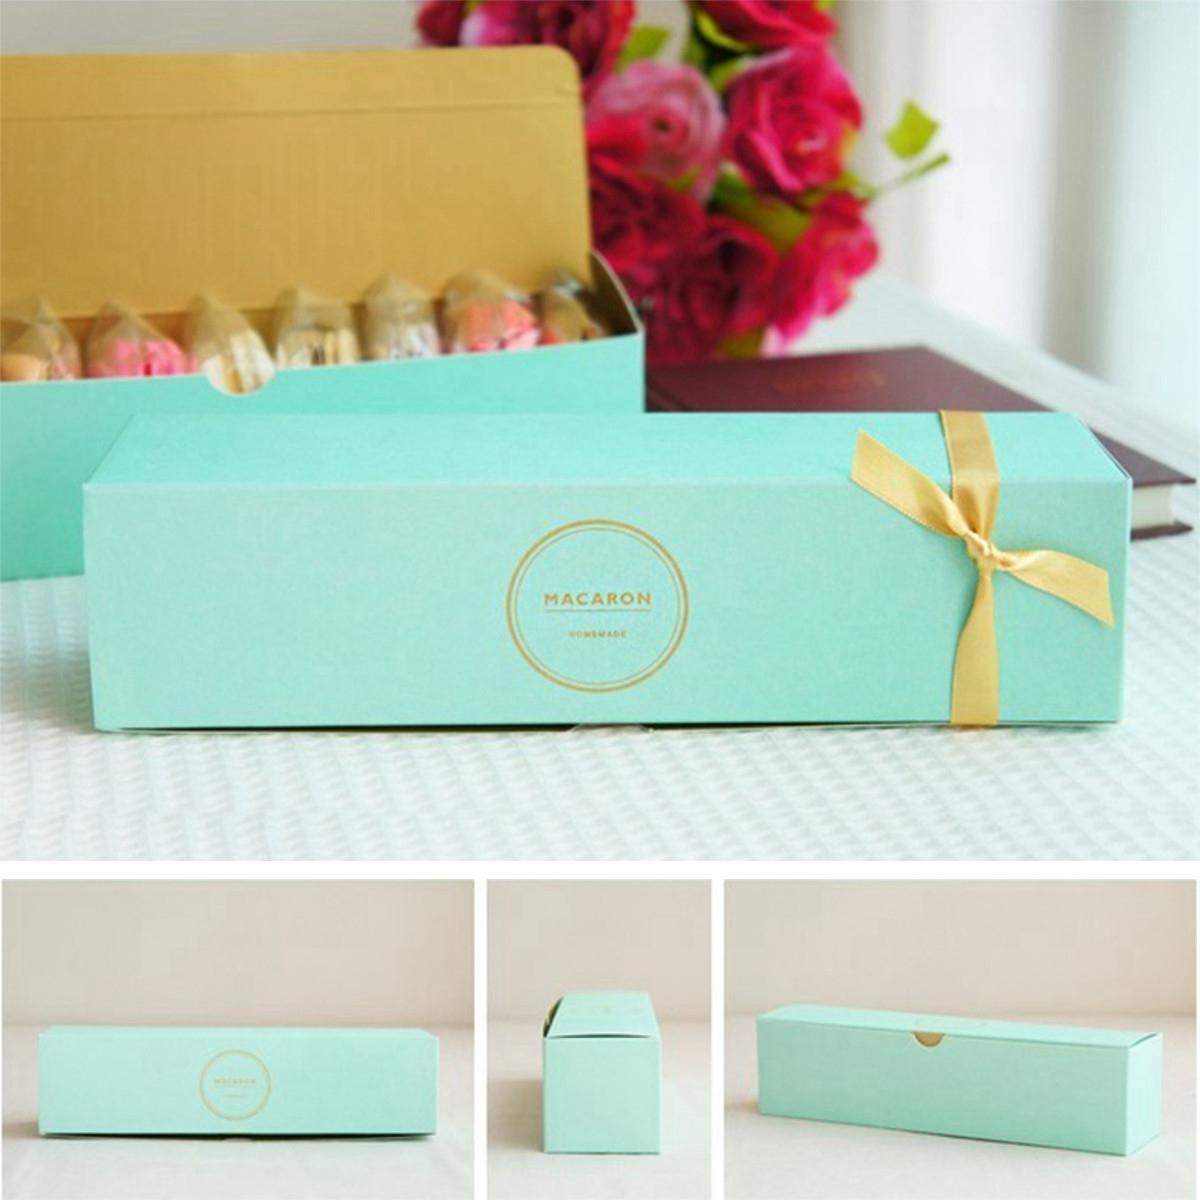 10Pcs Macaron Box Cookie Cake Chocolate Storage Packing Paper Box Wedding Party Gift